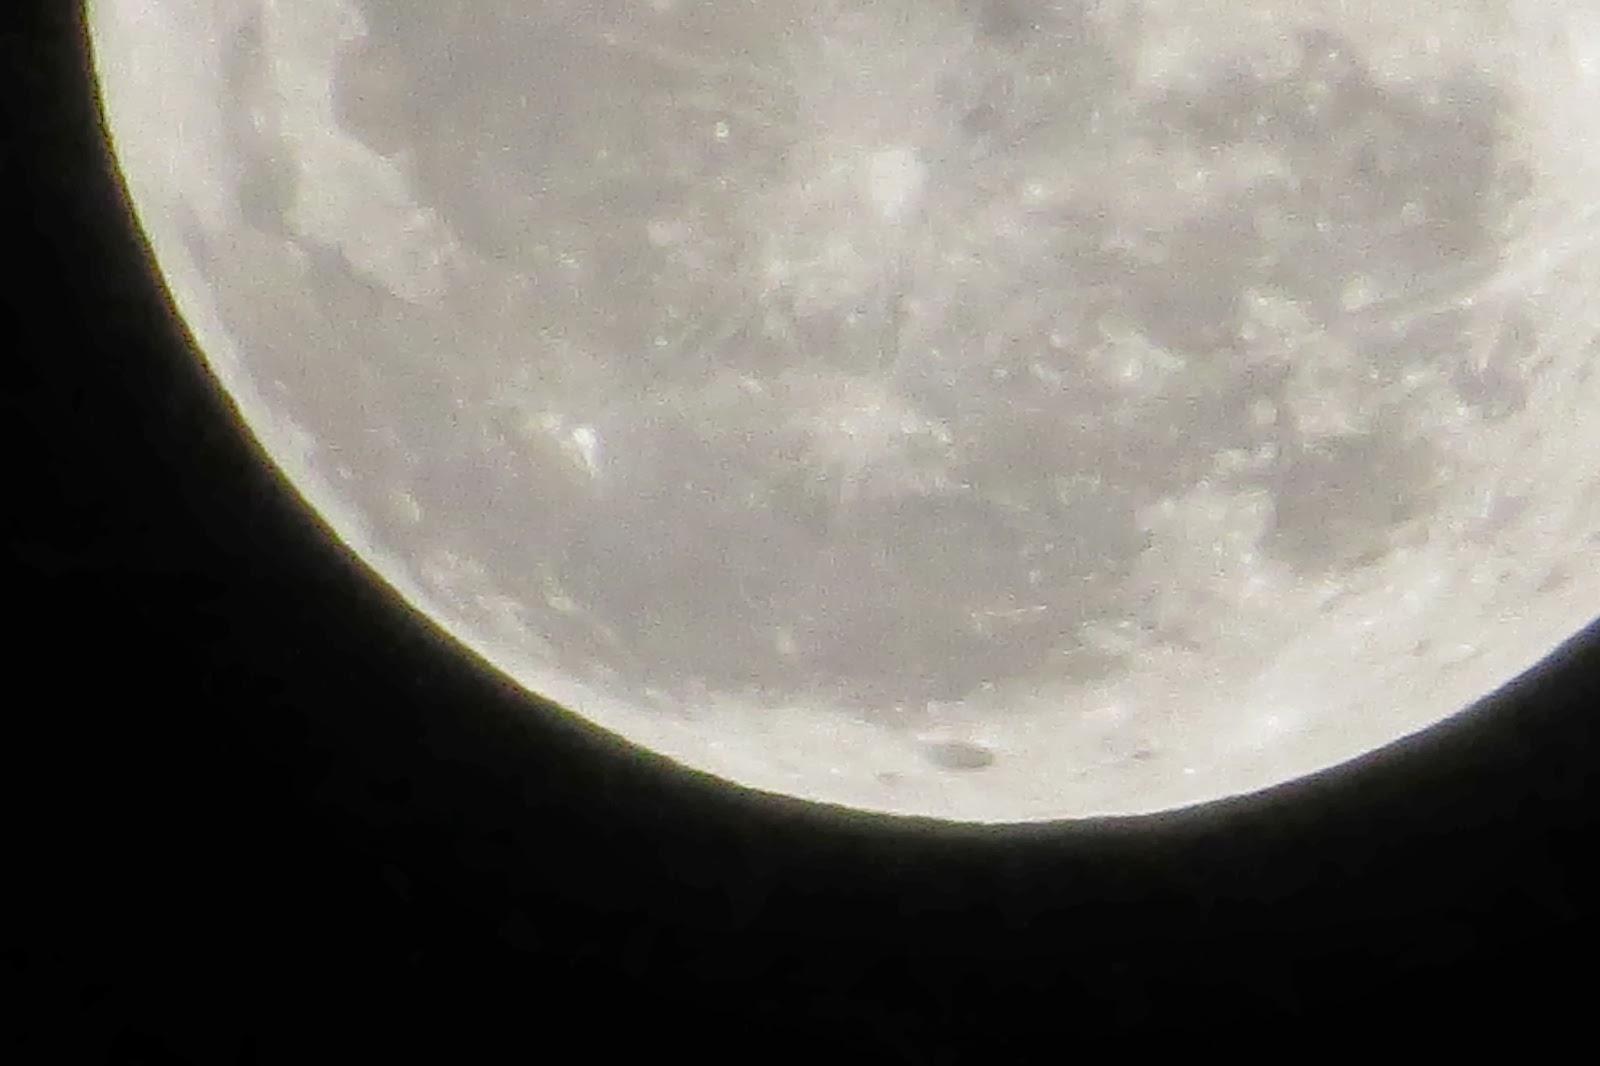 #photography #moon